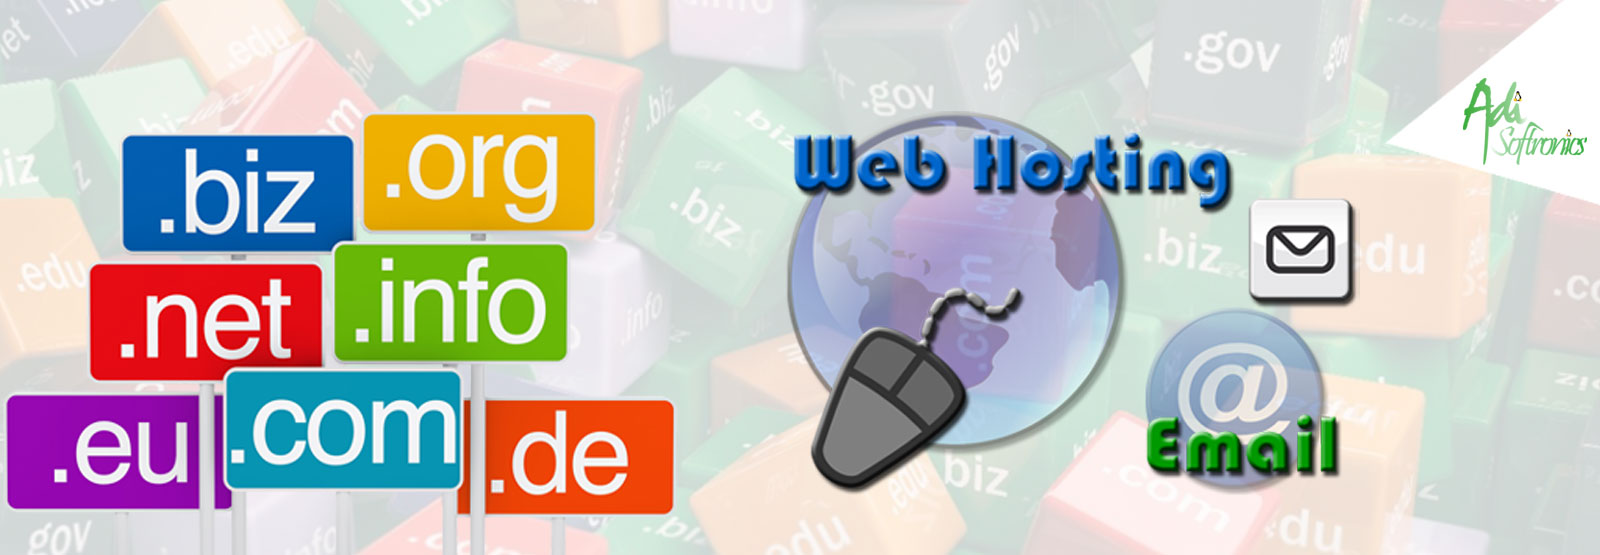 Indian Hosting - Web Hosting Company In Delhi